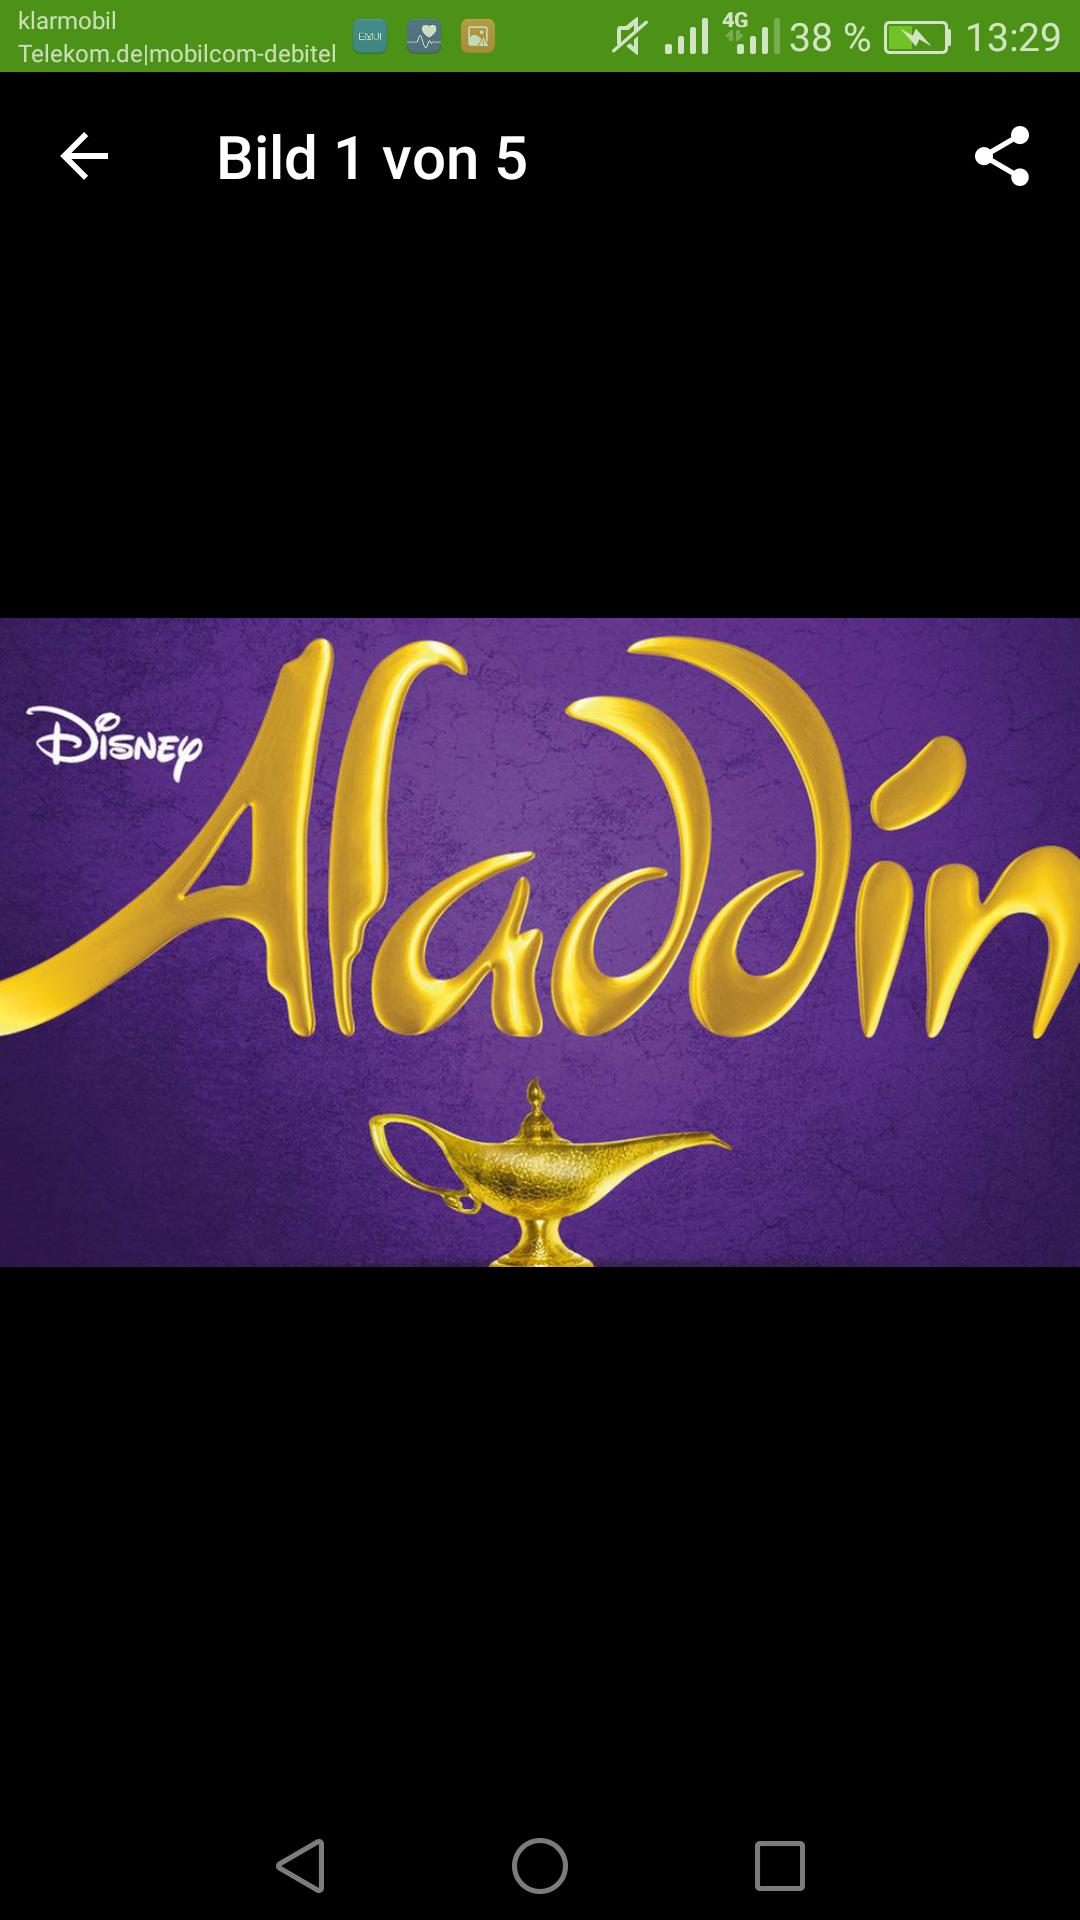 Disney Musical Aladdin in Hamburg, 27 -38 % Rabatt je nach Kategorie ab 54.90, groupon